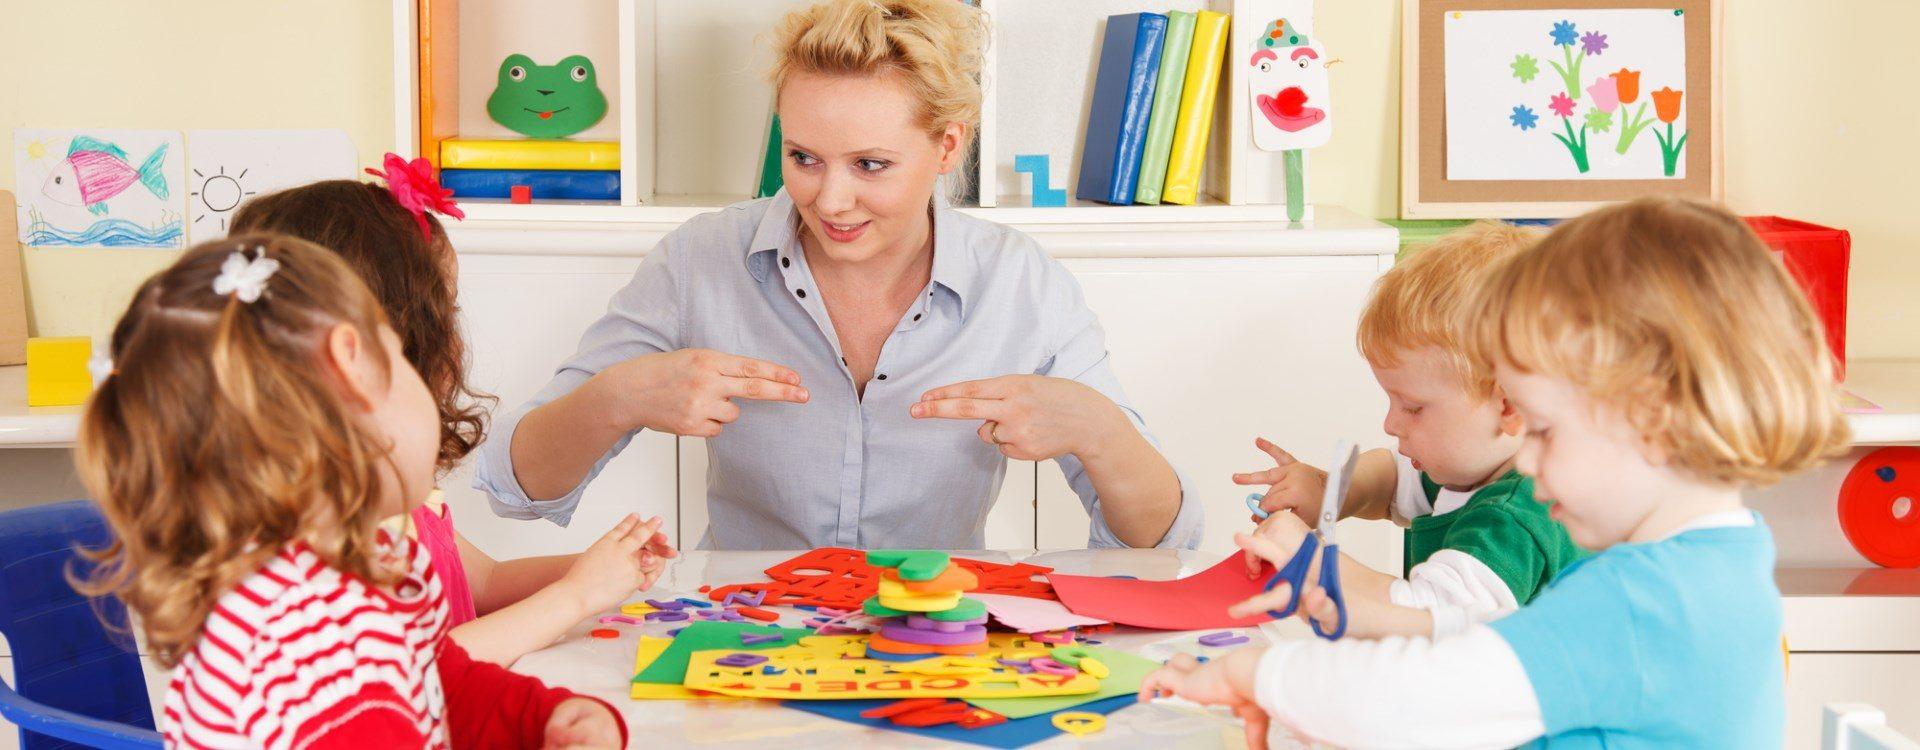 Kinderbetreuung U3-Bereich